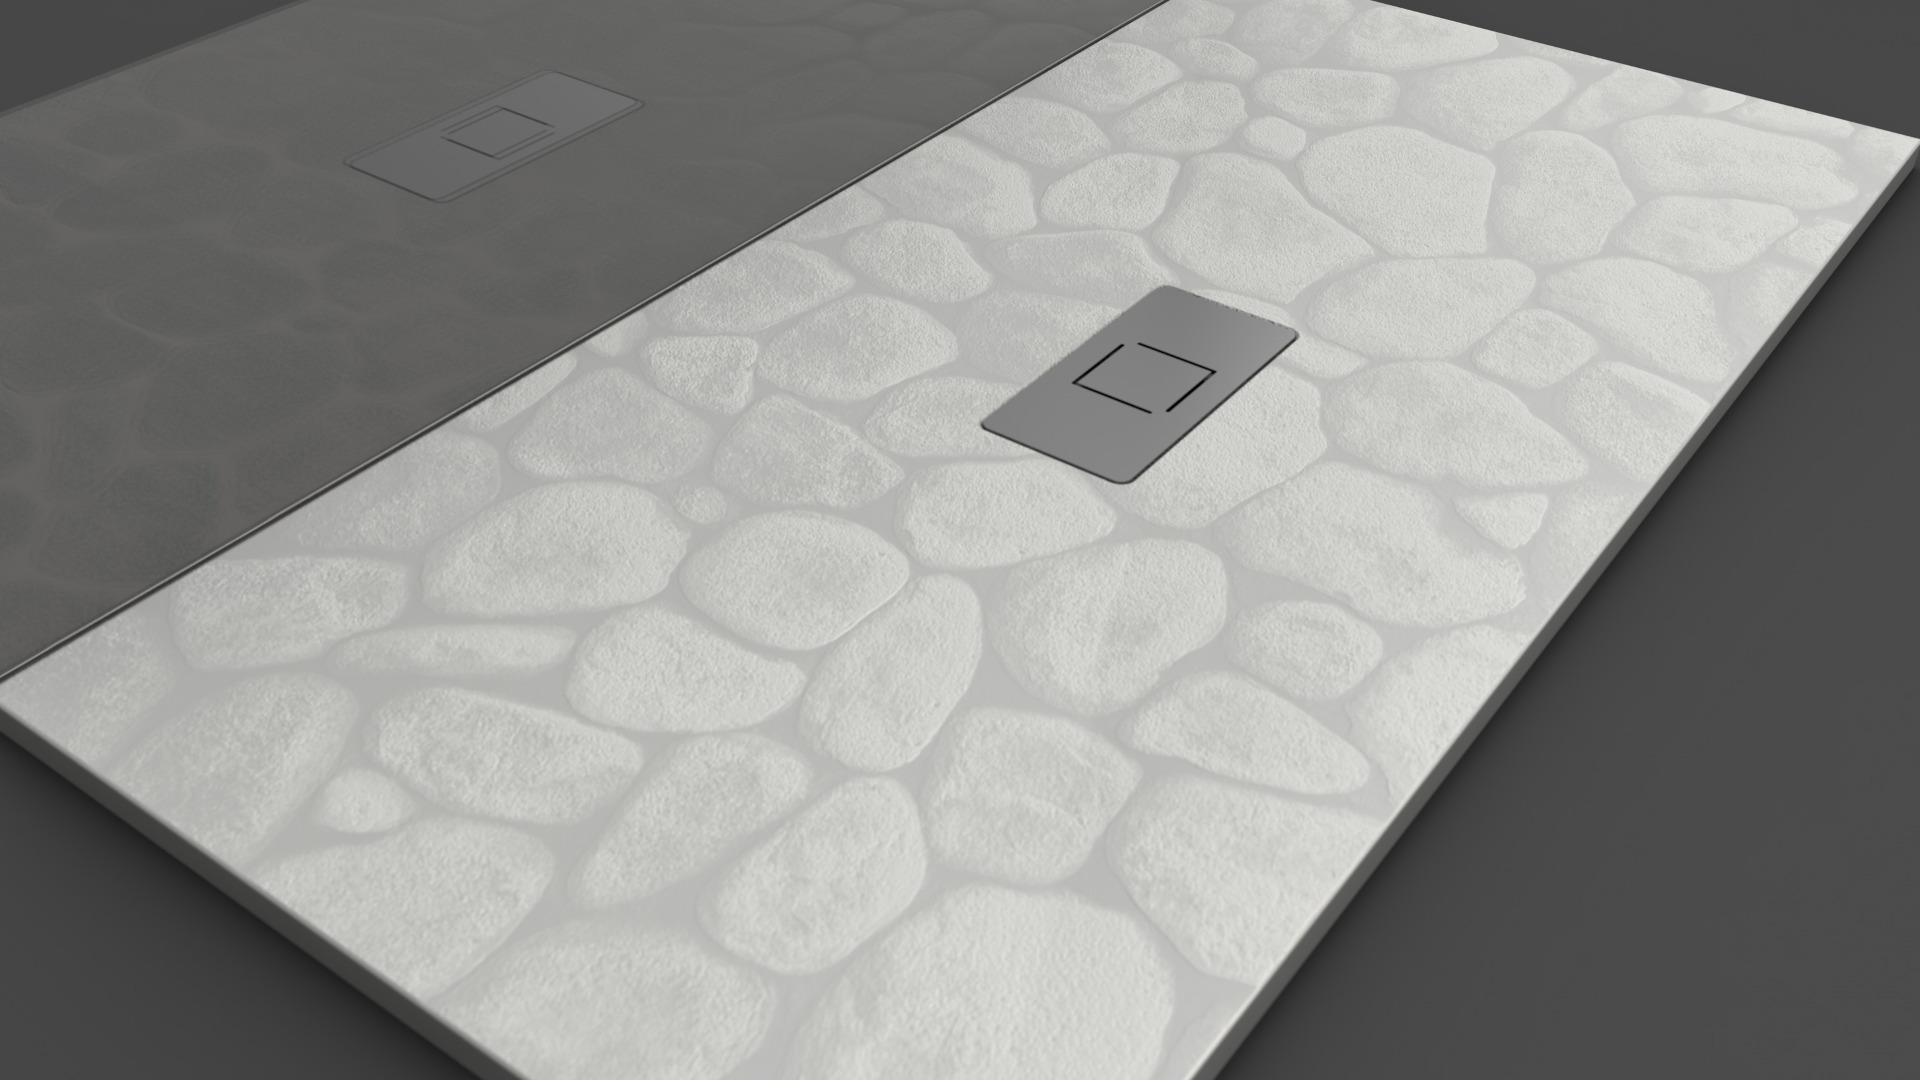 Texence Double Center Square - Plato de ducha textura piedras